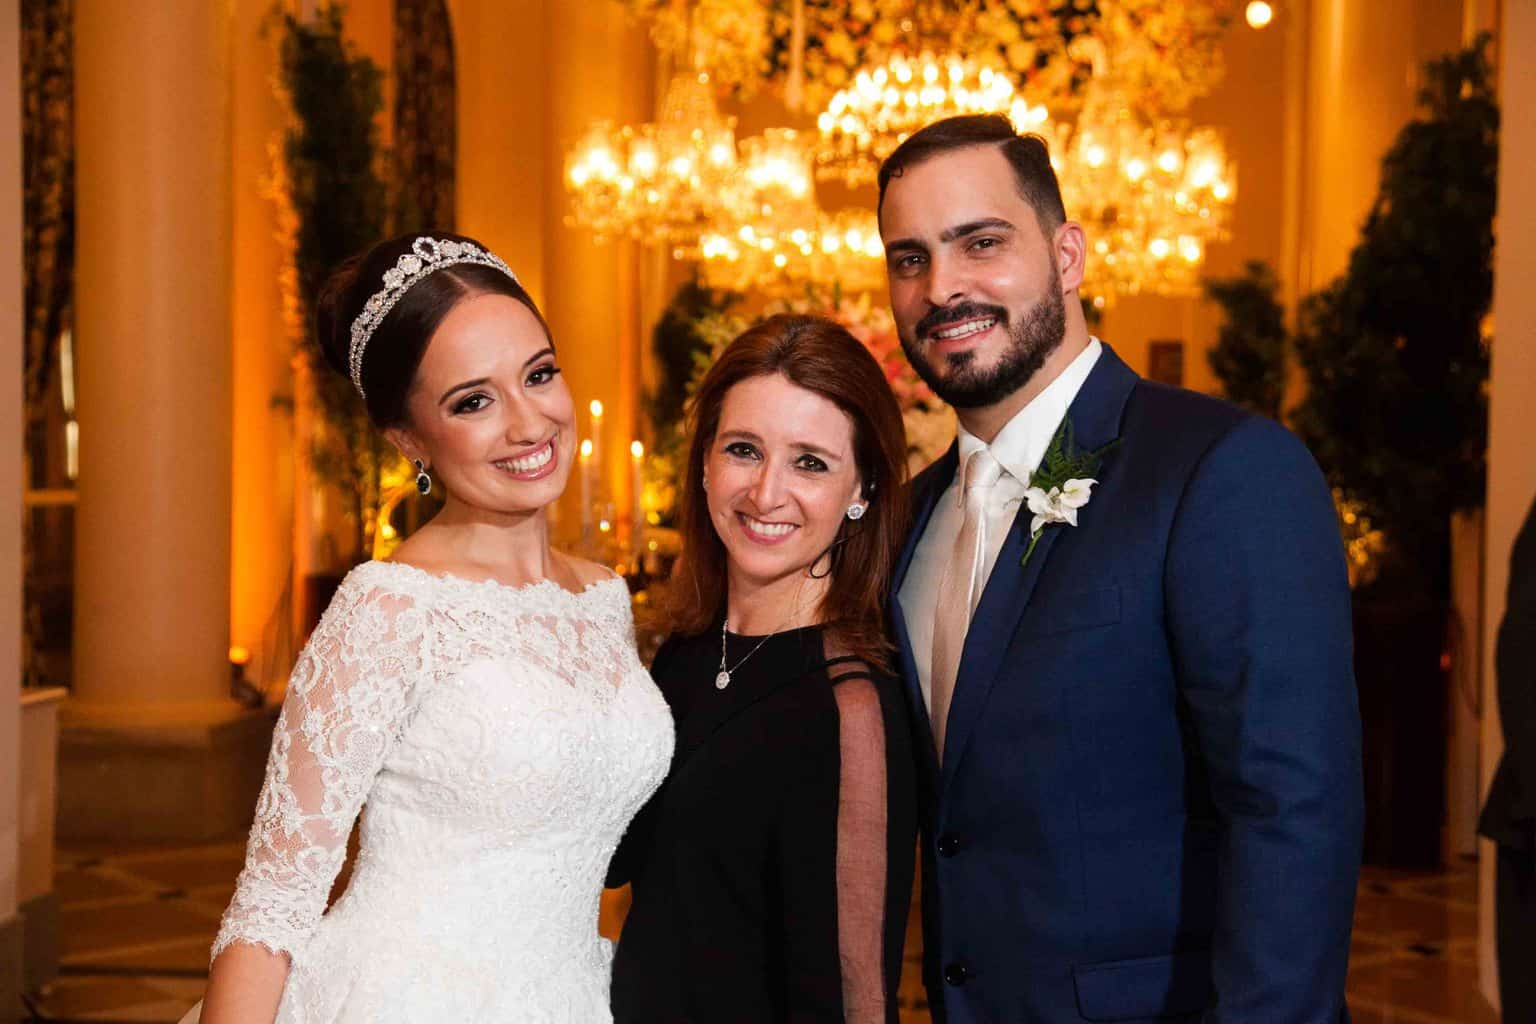 Casamento-Clássico-Casamento-tradicional-Copacabana-Palace-Monica-Roias-Paula-Rocha-Ribas-Foto-e-Vídeo-Tuanny-e-Bernardo-CaseMe